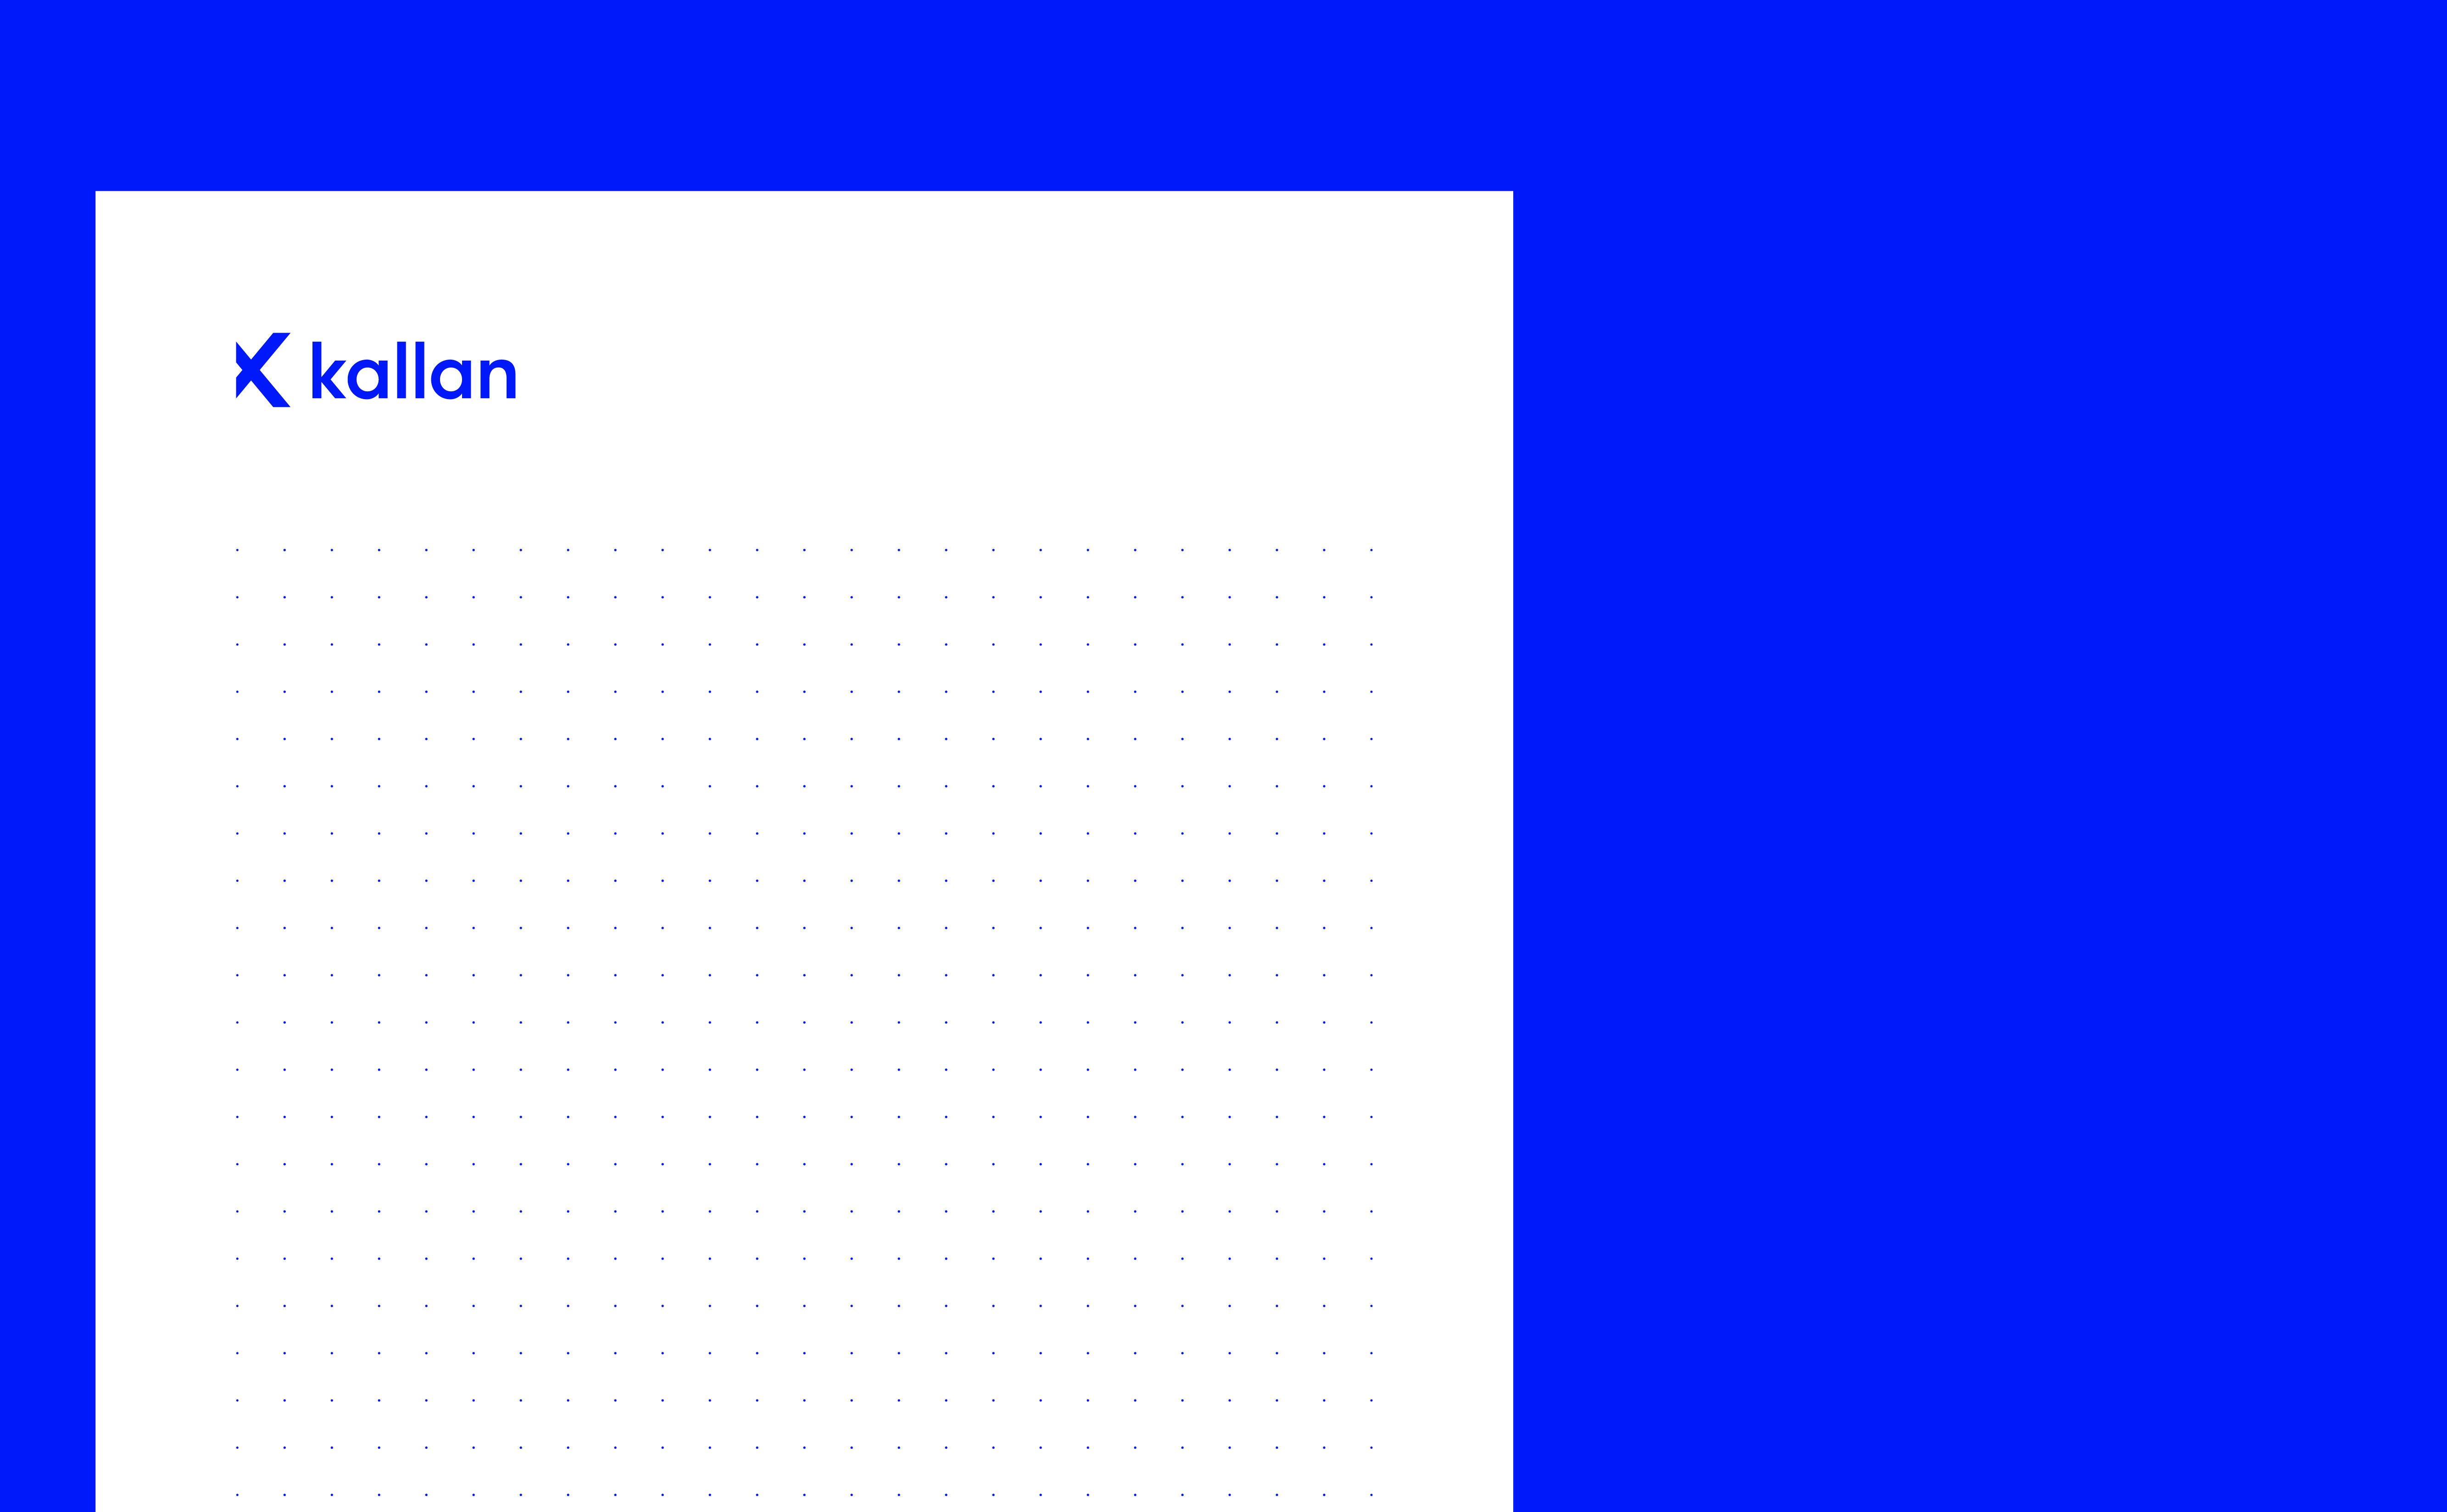 SHVI-kallan-block